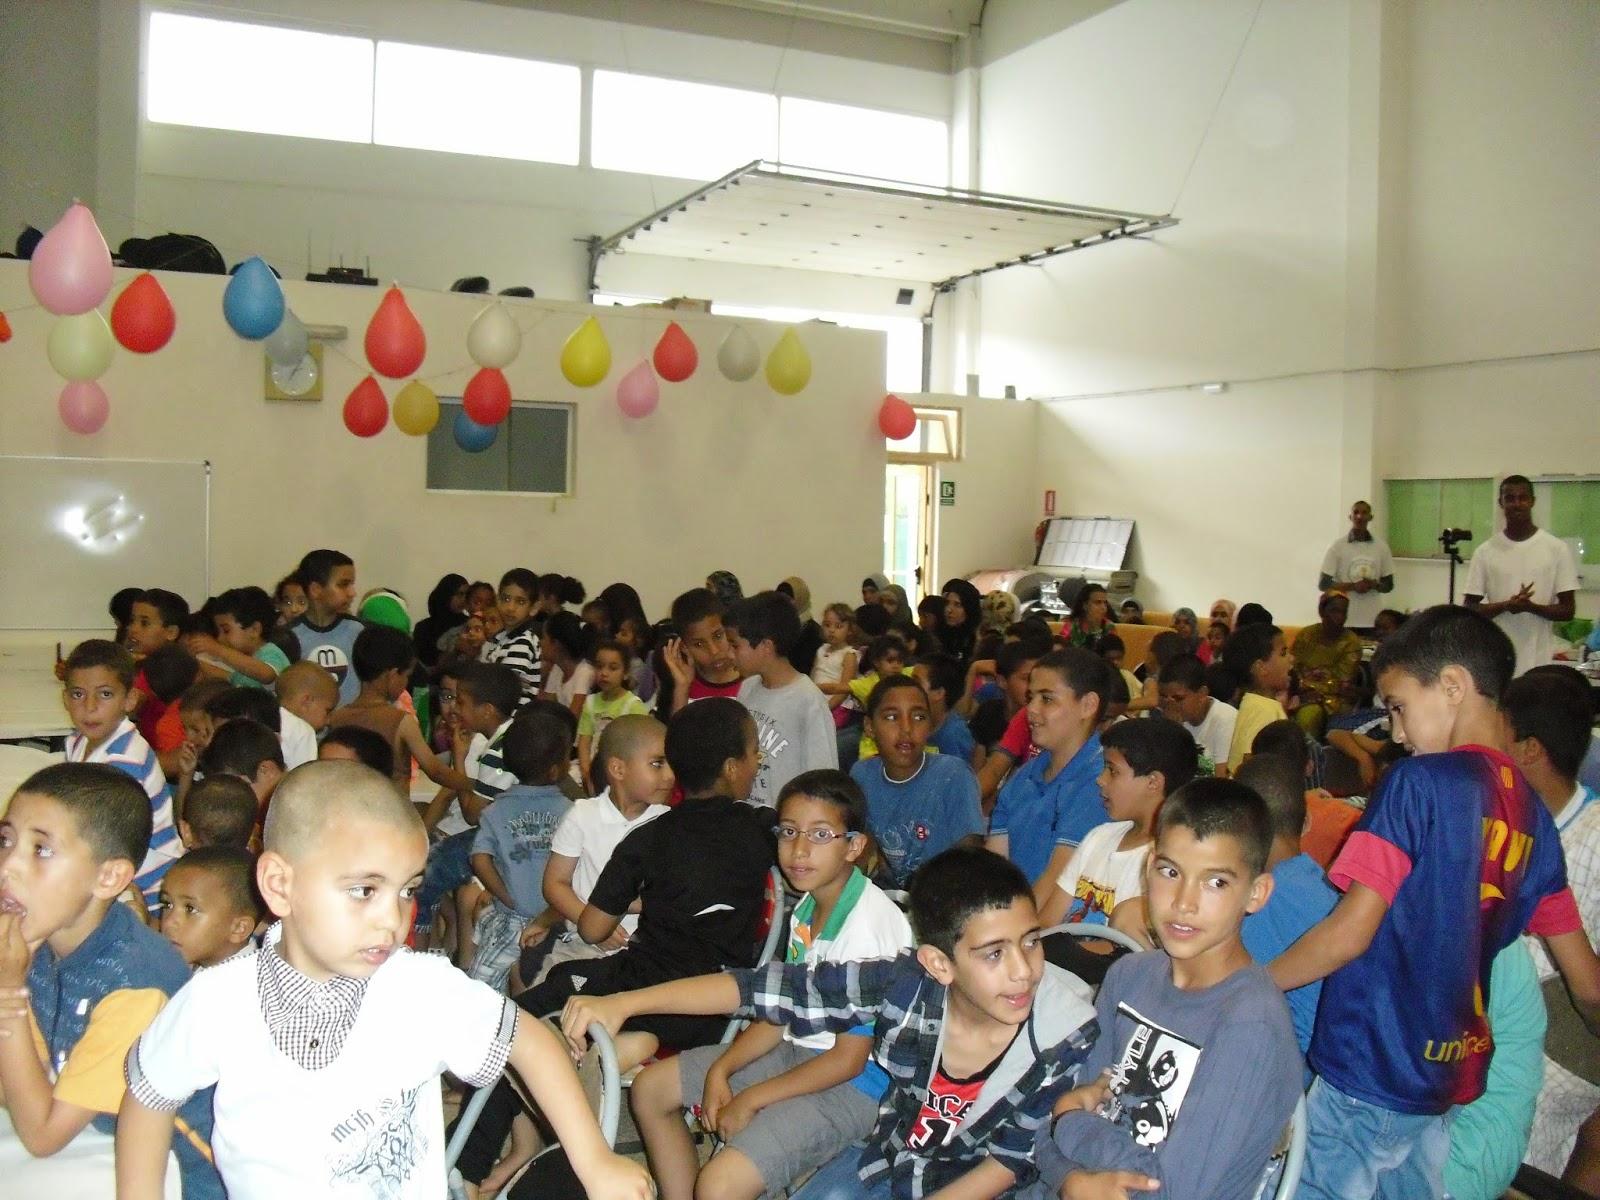 Fiesta de fin de Curso 2013/2014 en Tortosa-Roquetes